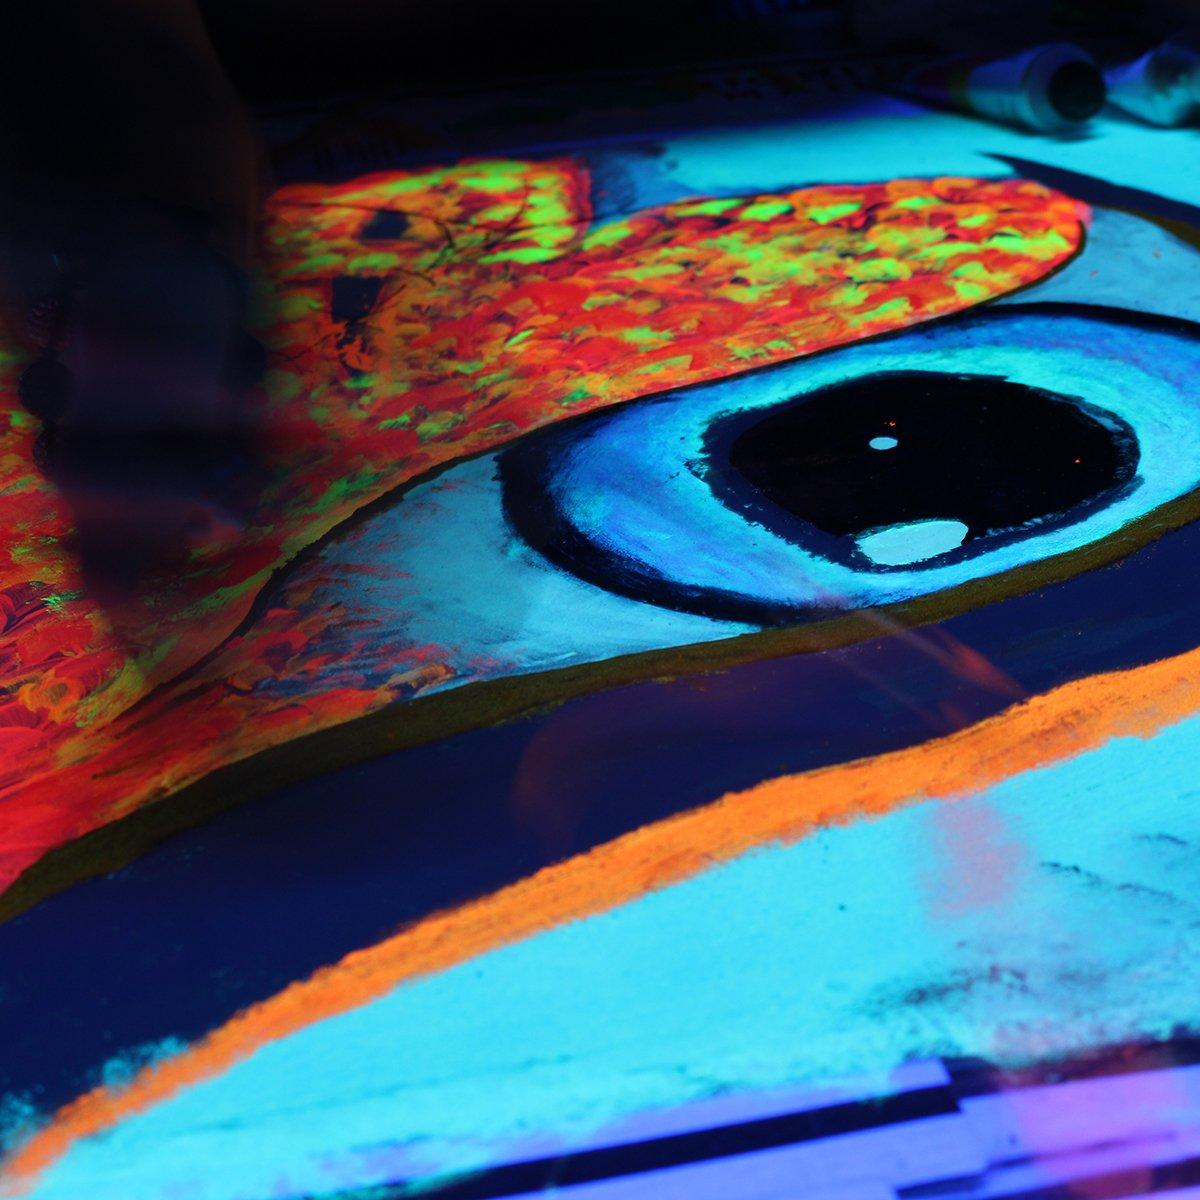 Blue Glow in the Dark & UV Reactive Pigment Powder - 500 Grams by Techno Glow Inc (Image #7)